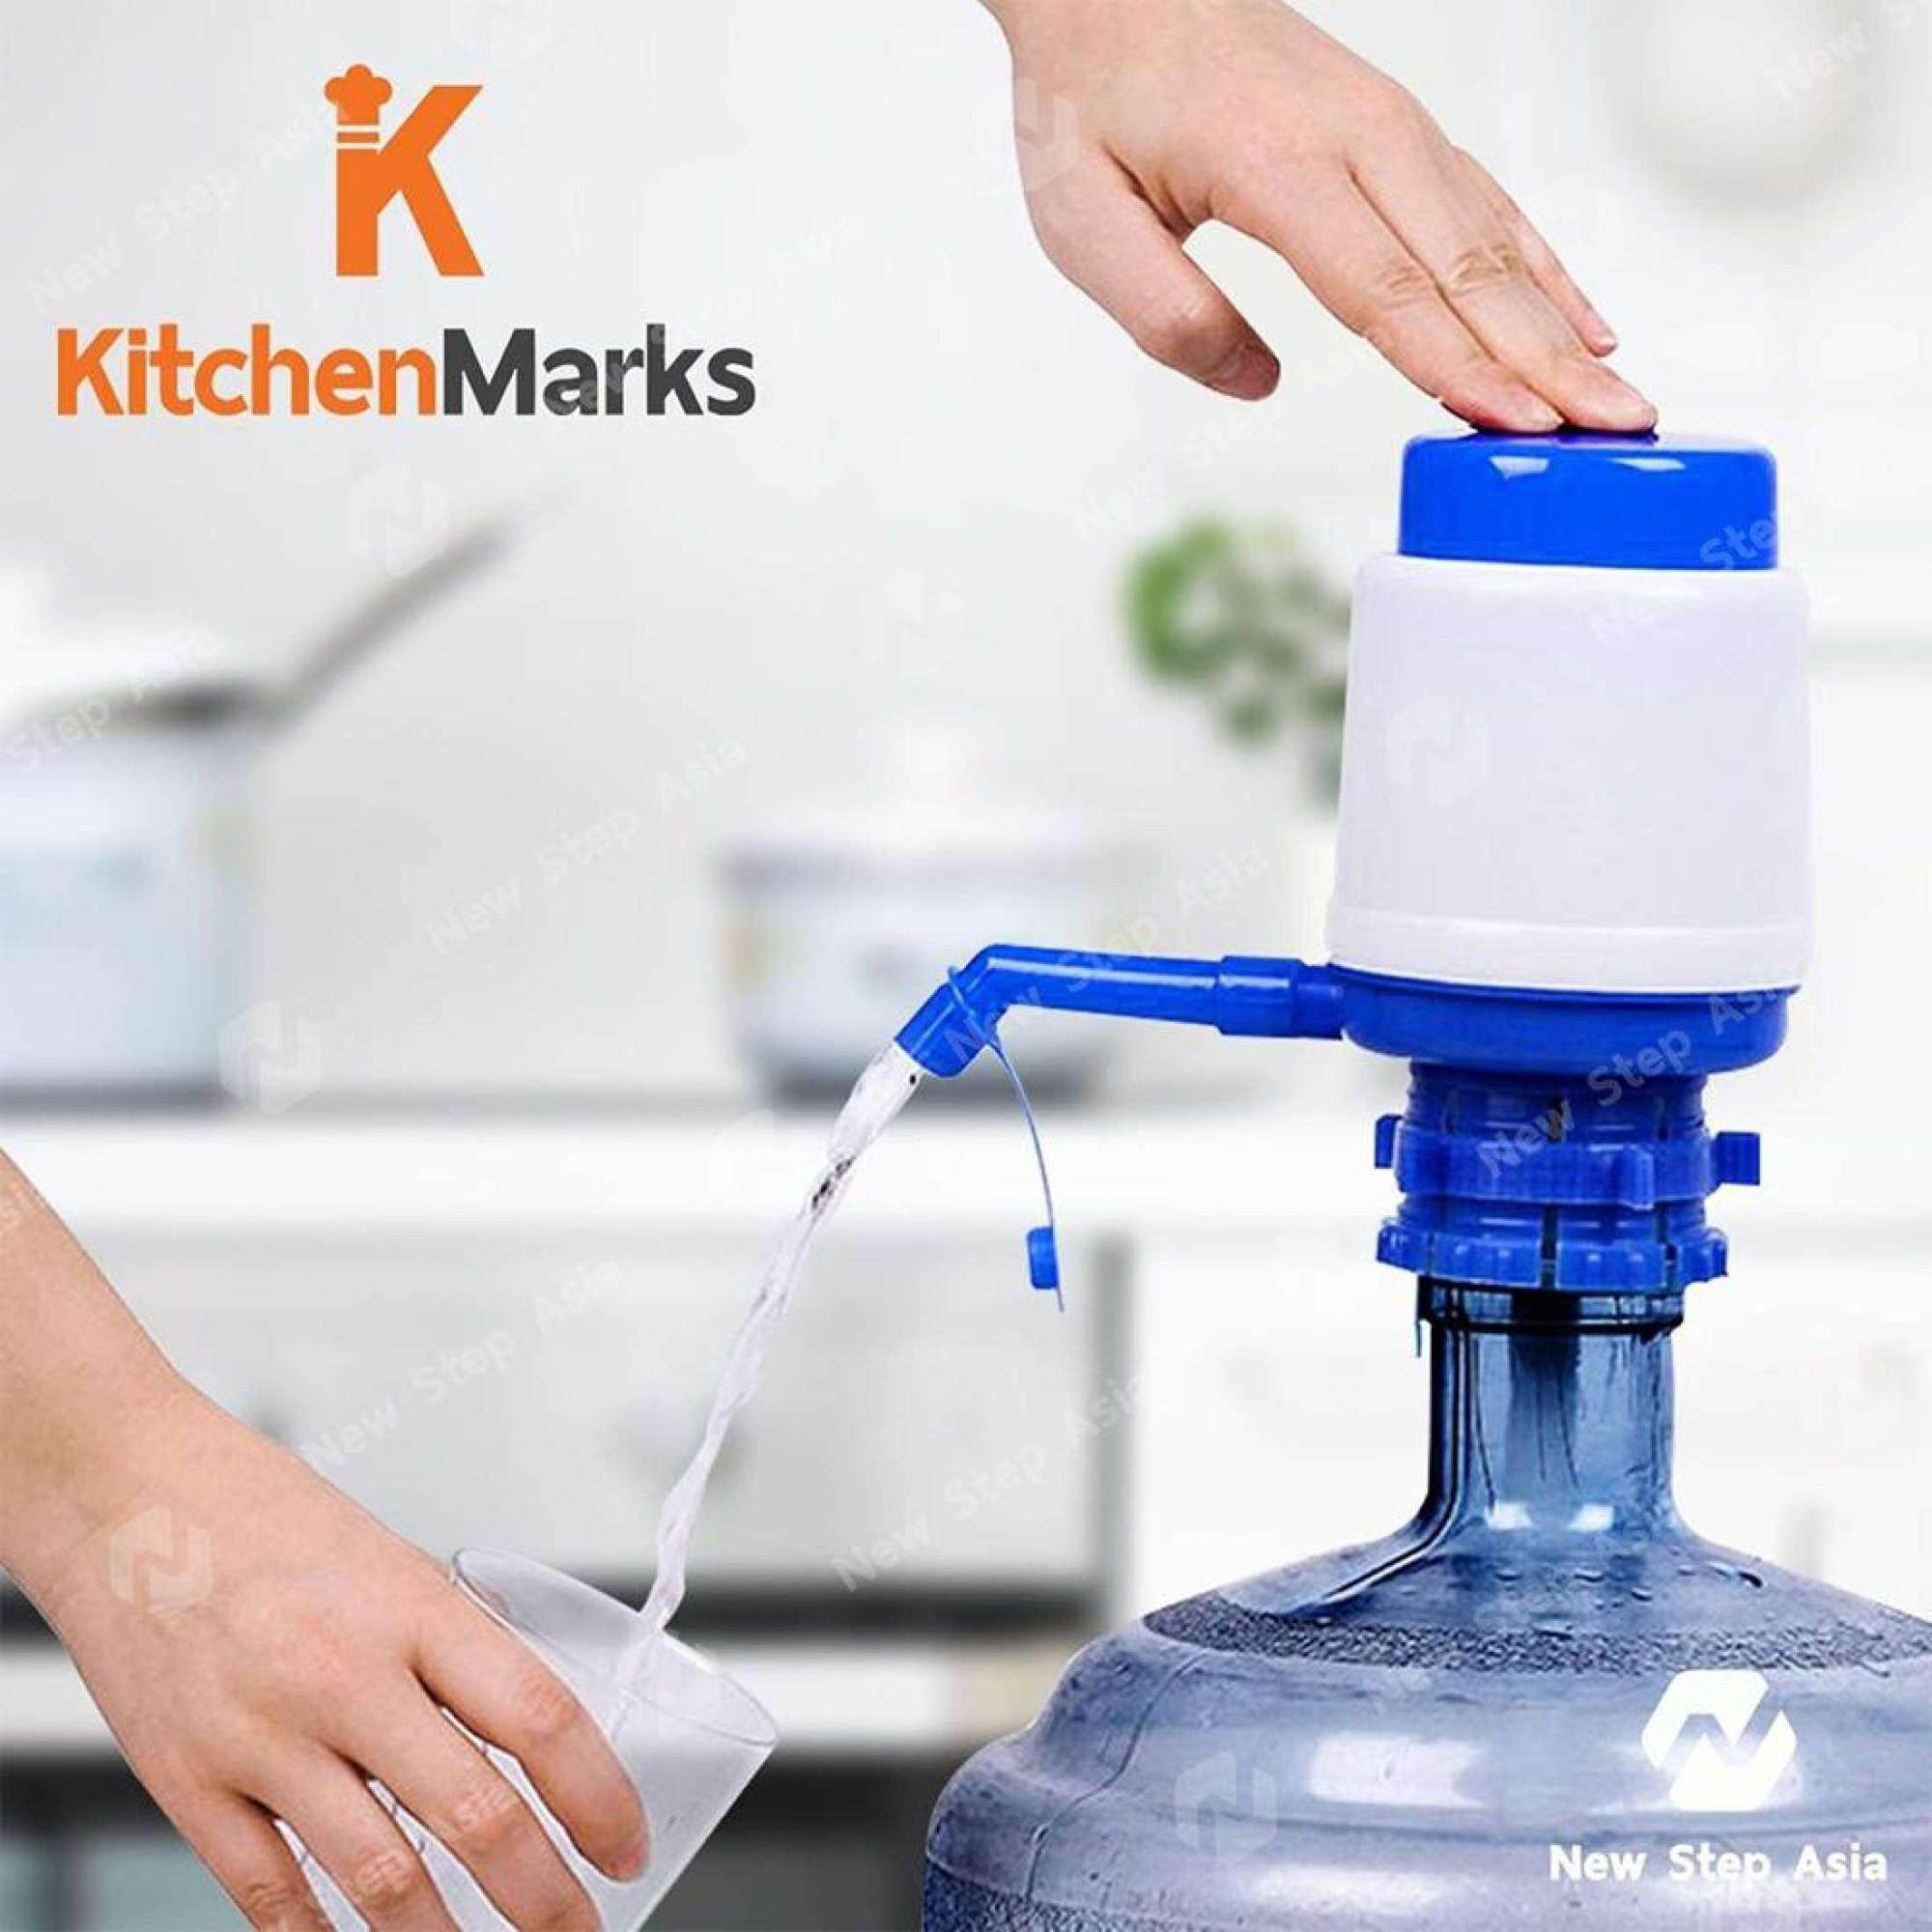 KitchenMarks อุปกรณ์ปั้มน้ำดื่มจากแกลลอน แบบมือกด ที่กดน้ำดื่ม ที่กดน้ำ ปั๊มน้ำ ปั้มน้ำดืม แบบมือกด Pump Manual Drinking Water Pump new step asia